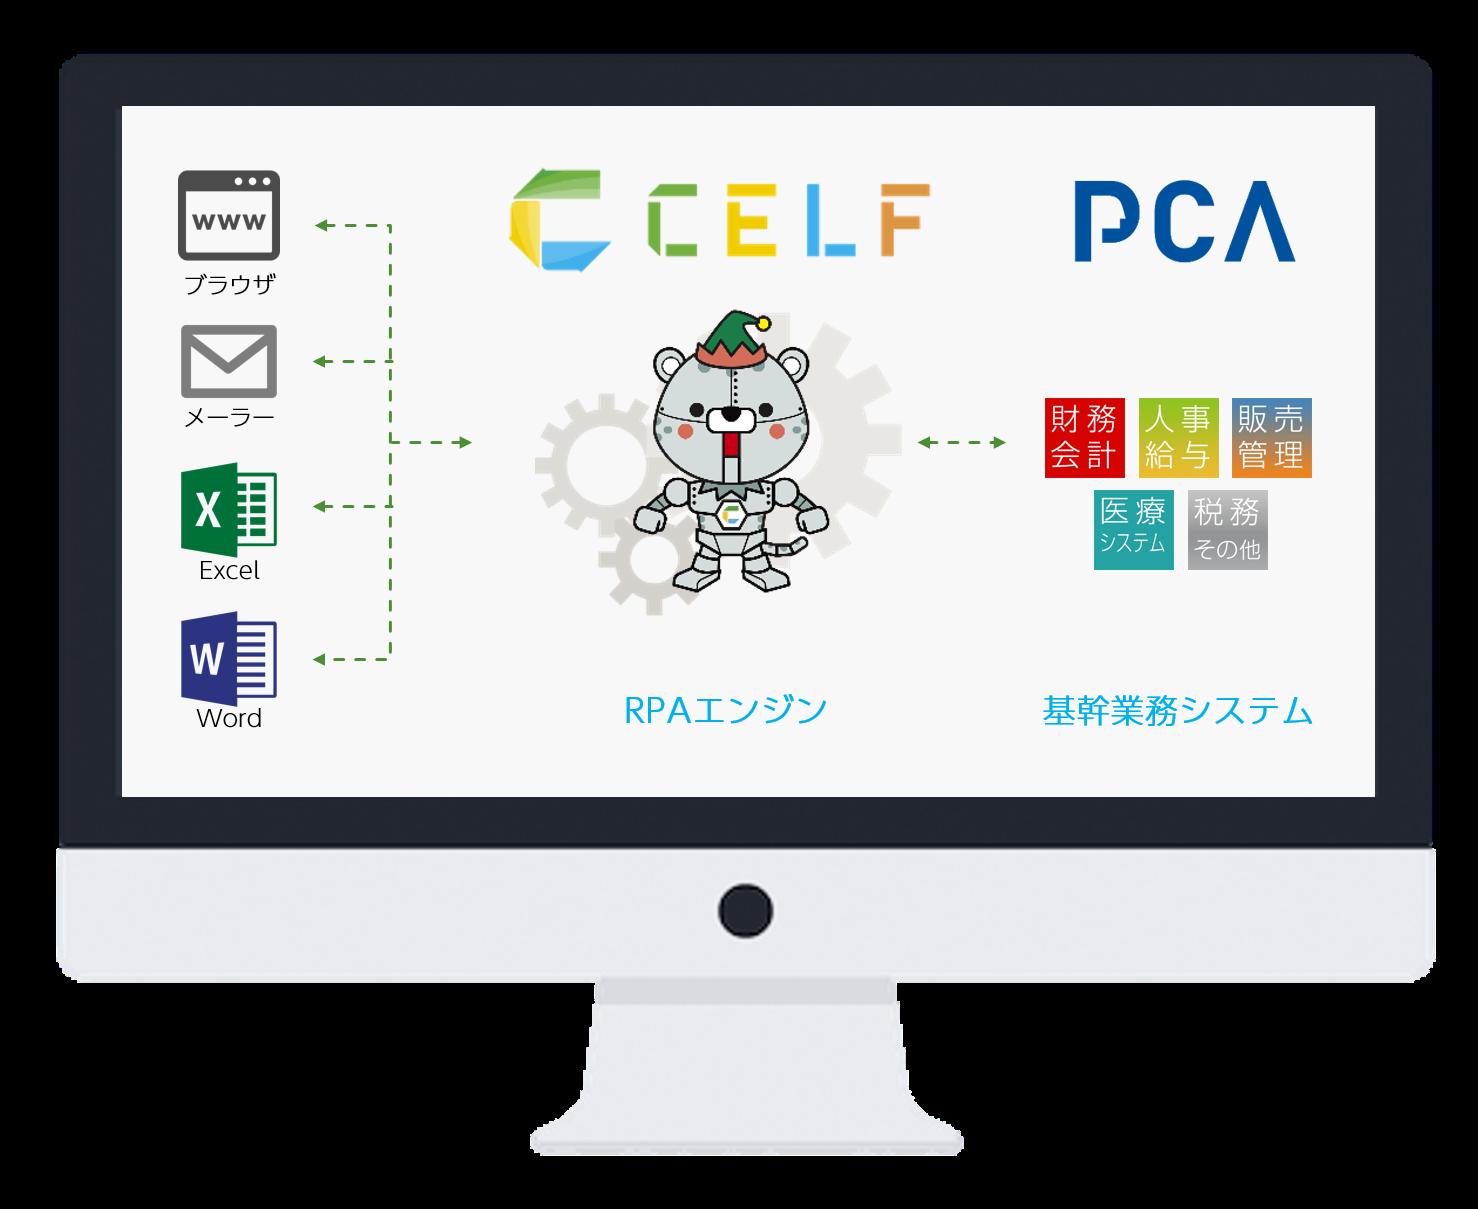 「PCA商魂」「PCA商管」と「CELF」のRPAエンジンの概念図